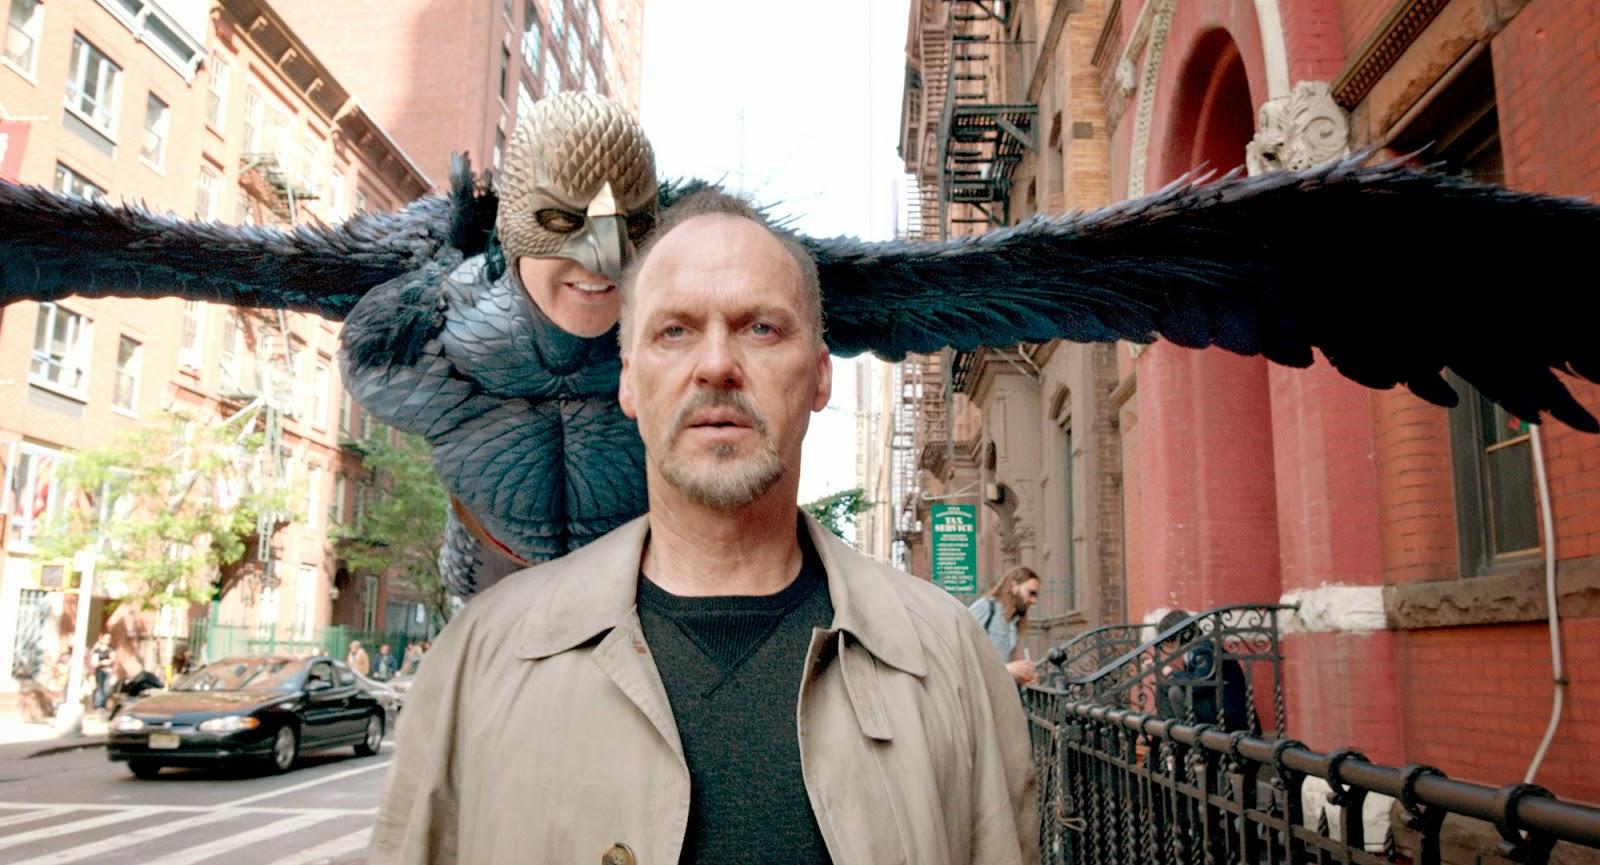 Michael Keaton as Riggan Thomas in Birdman (2014), Birdman's voice talking to Riggan, Directed by Alejandro González Iñárritu, Oscar-winning film